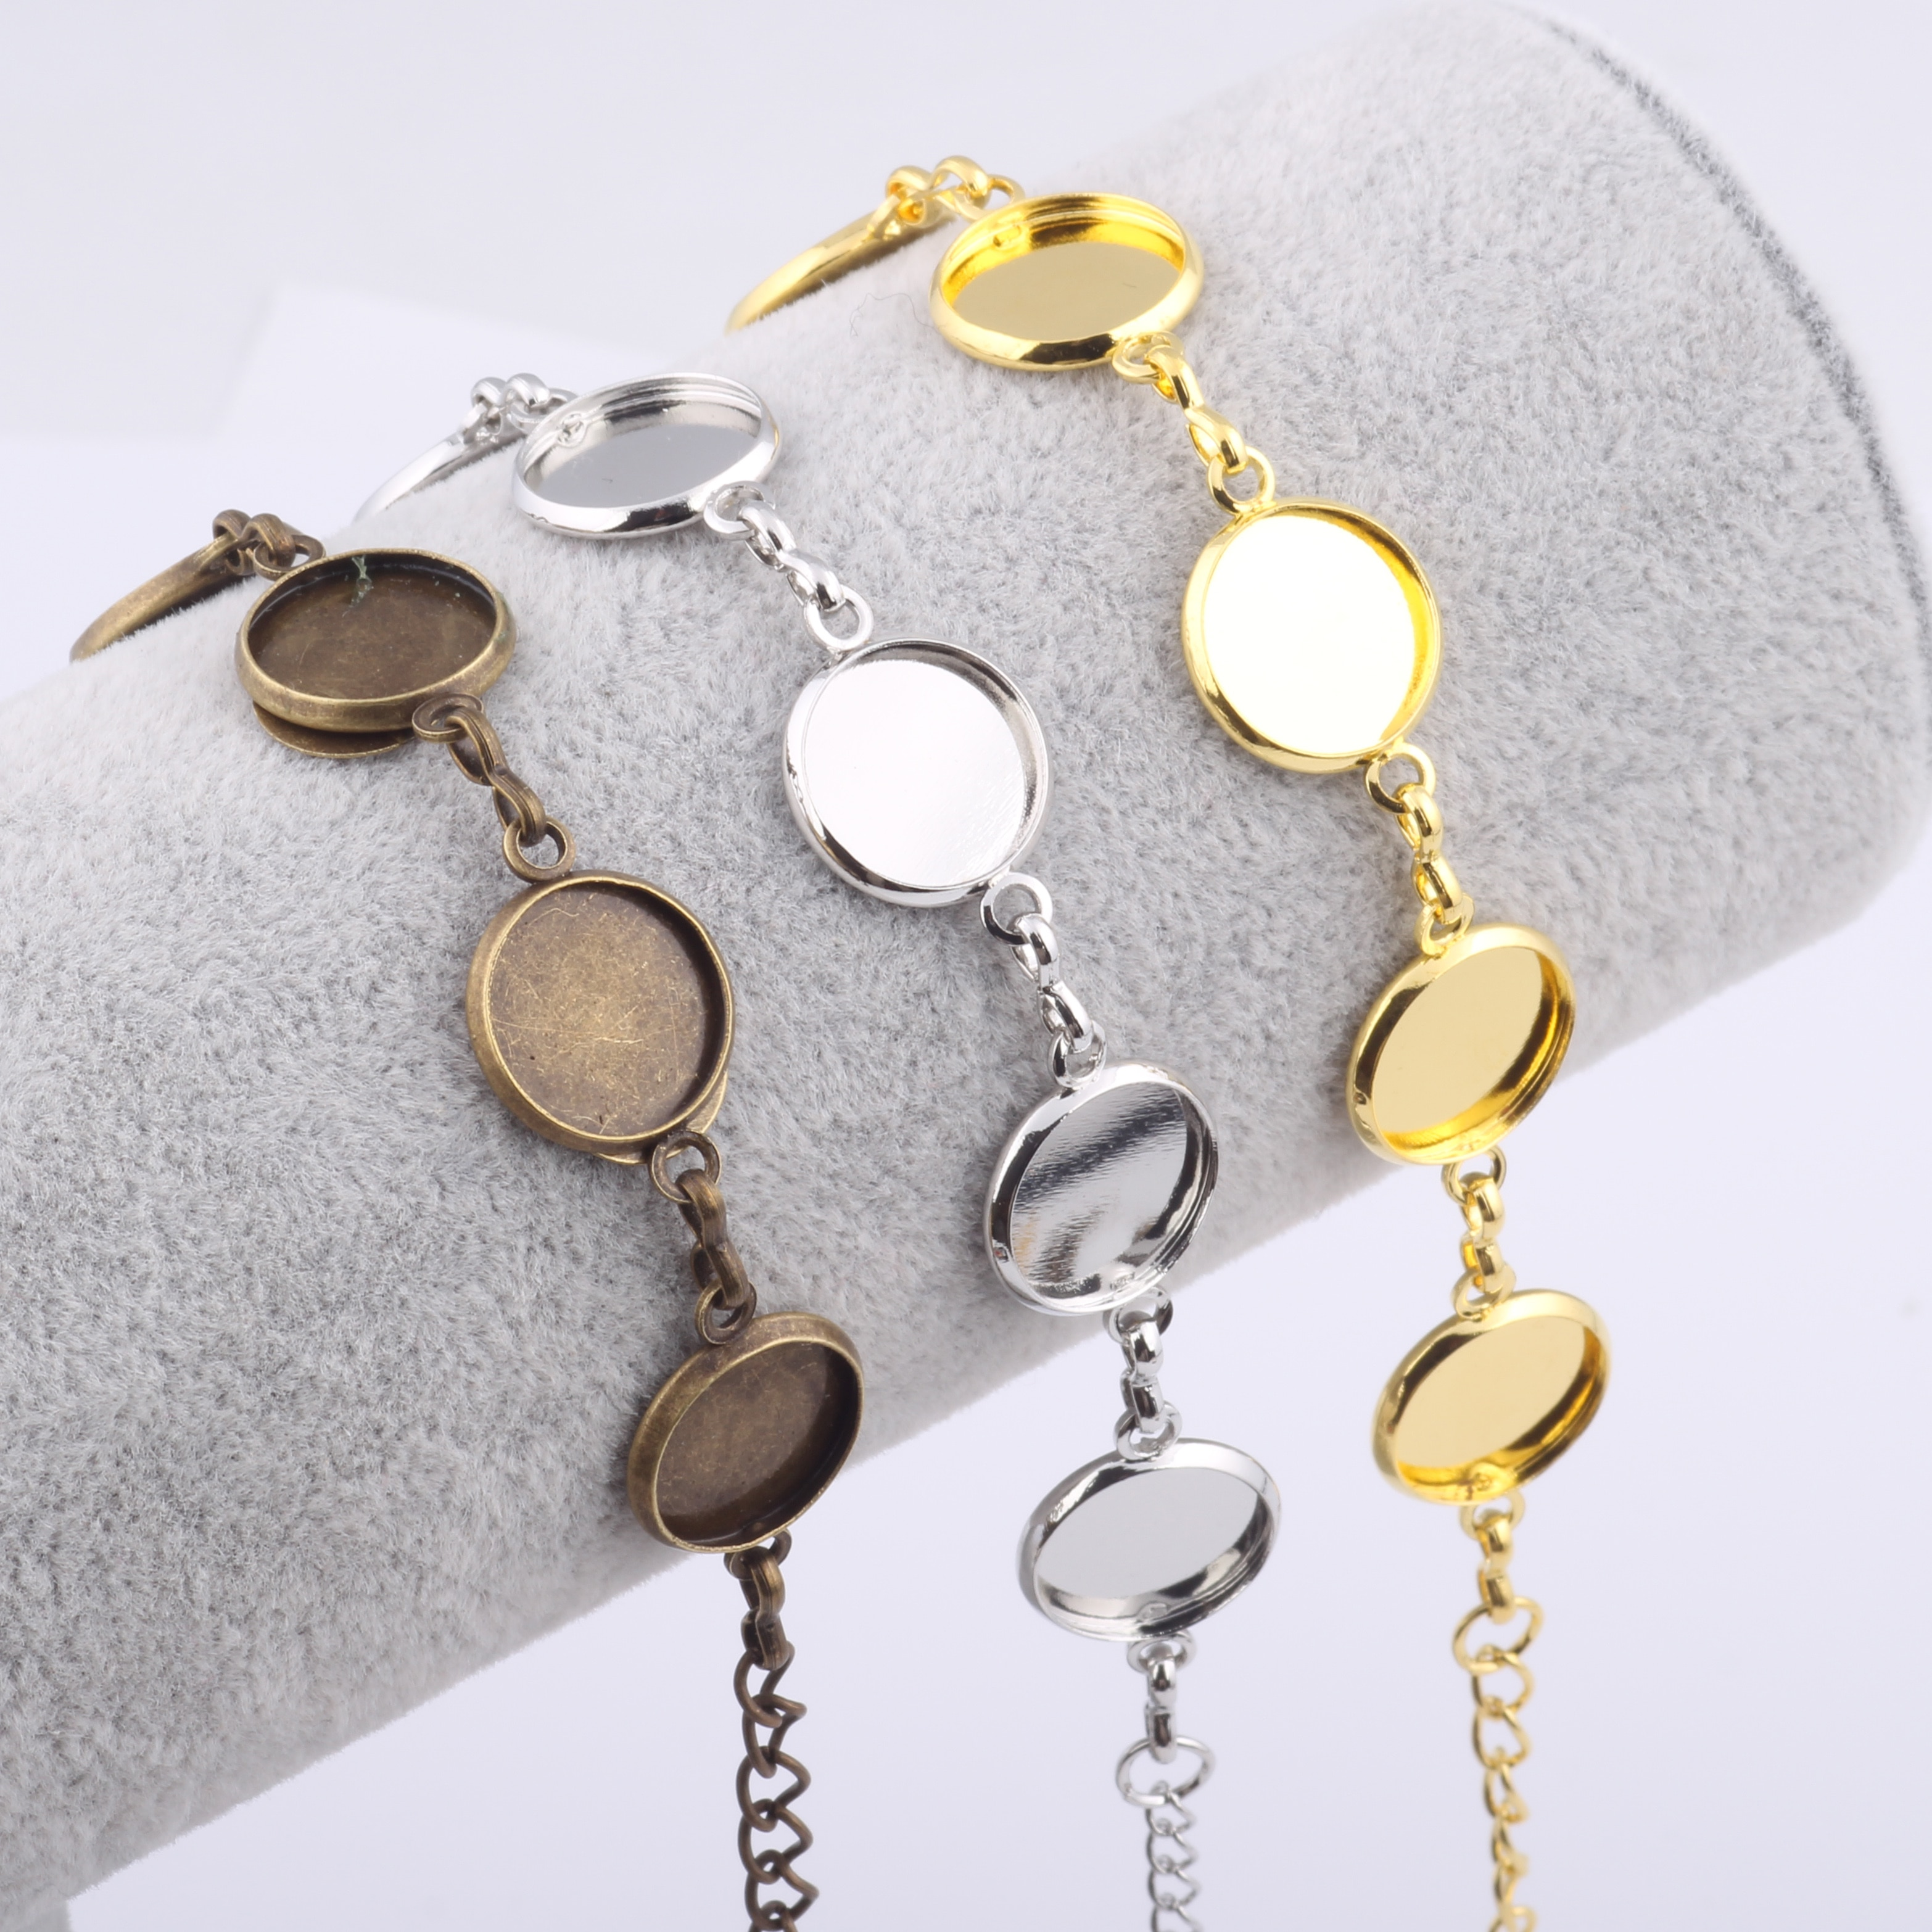 reidgaller 10pcs fit 12mm round cabochon bracelet base setting copper bezel bracelet blanks diy bracelets making supplies